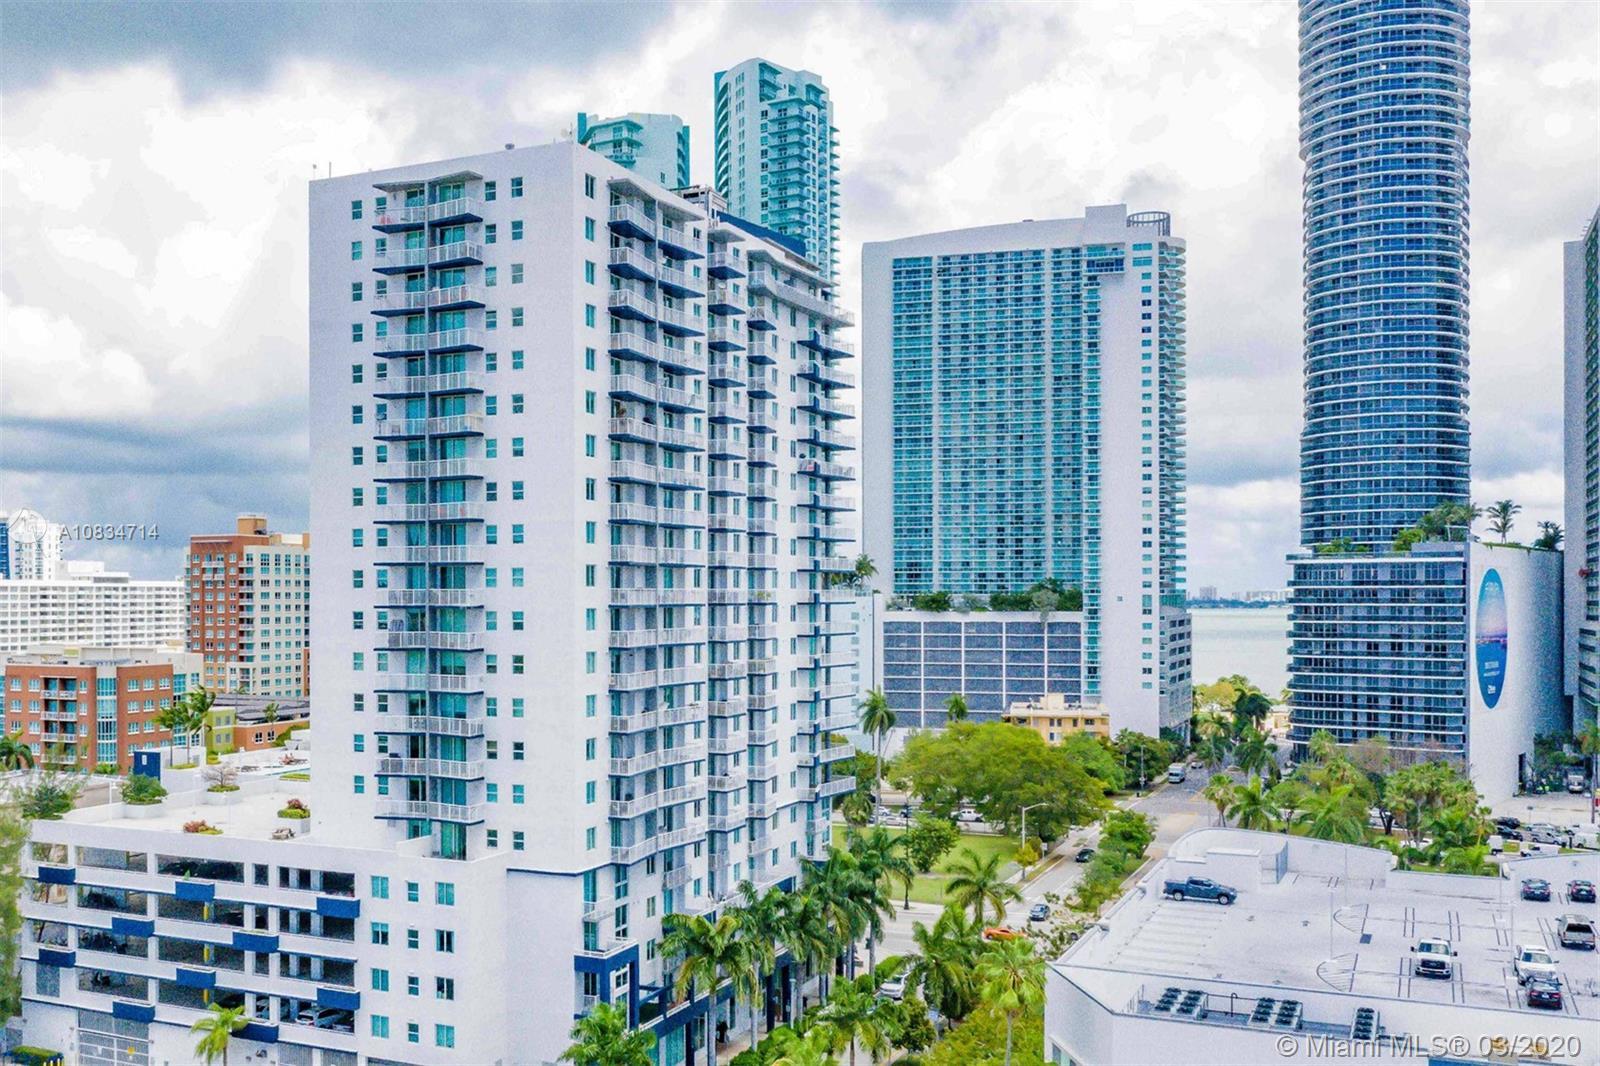 1800 Biscayne Plaza #1707 - 275 NE 18th St #1707, Miami, FL 33132